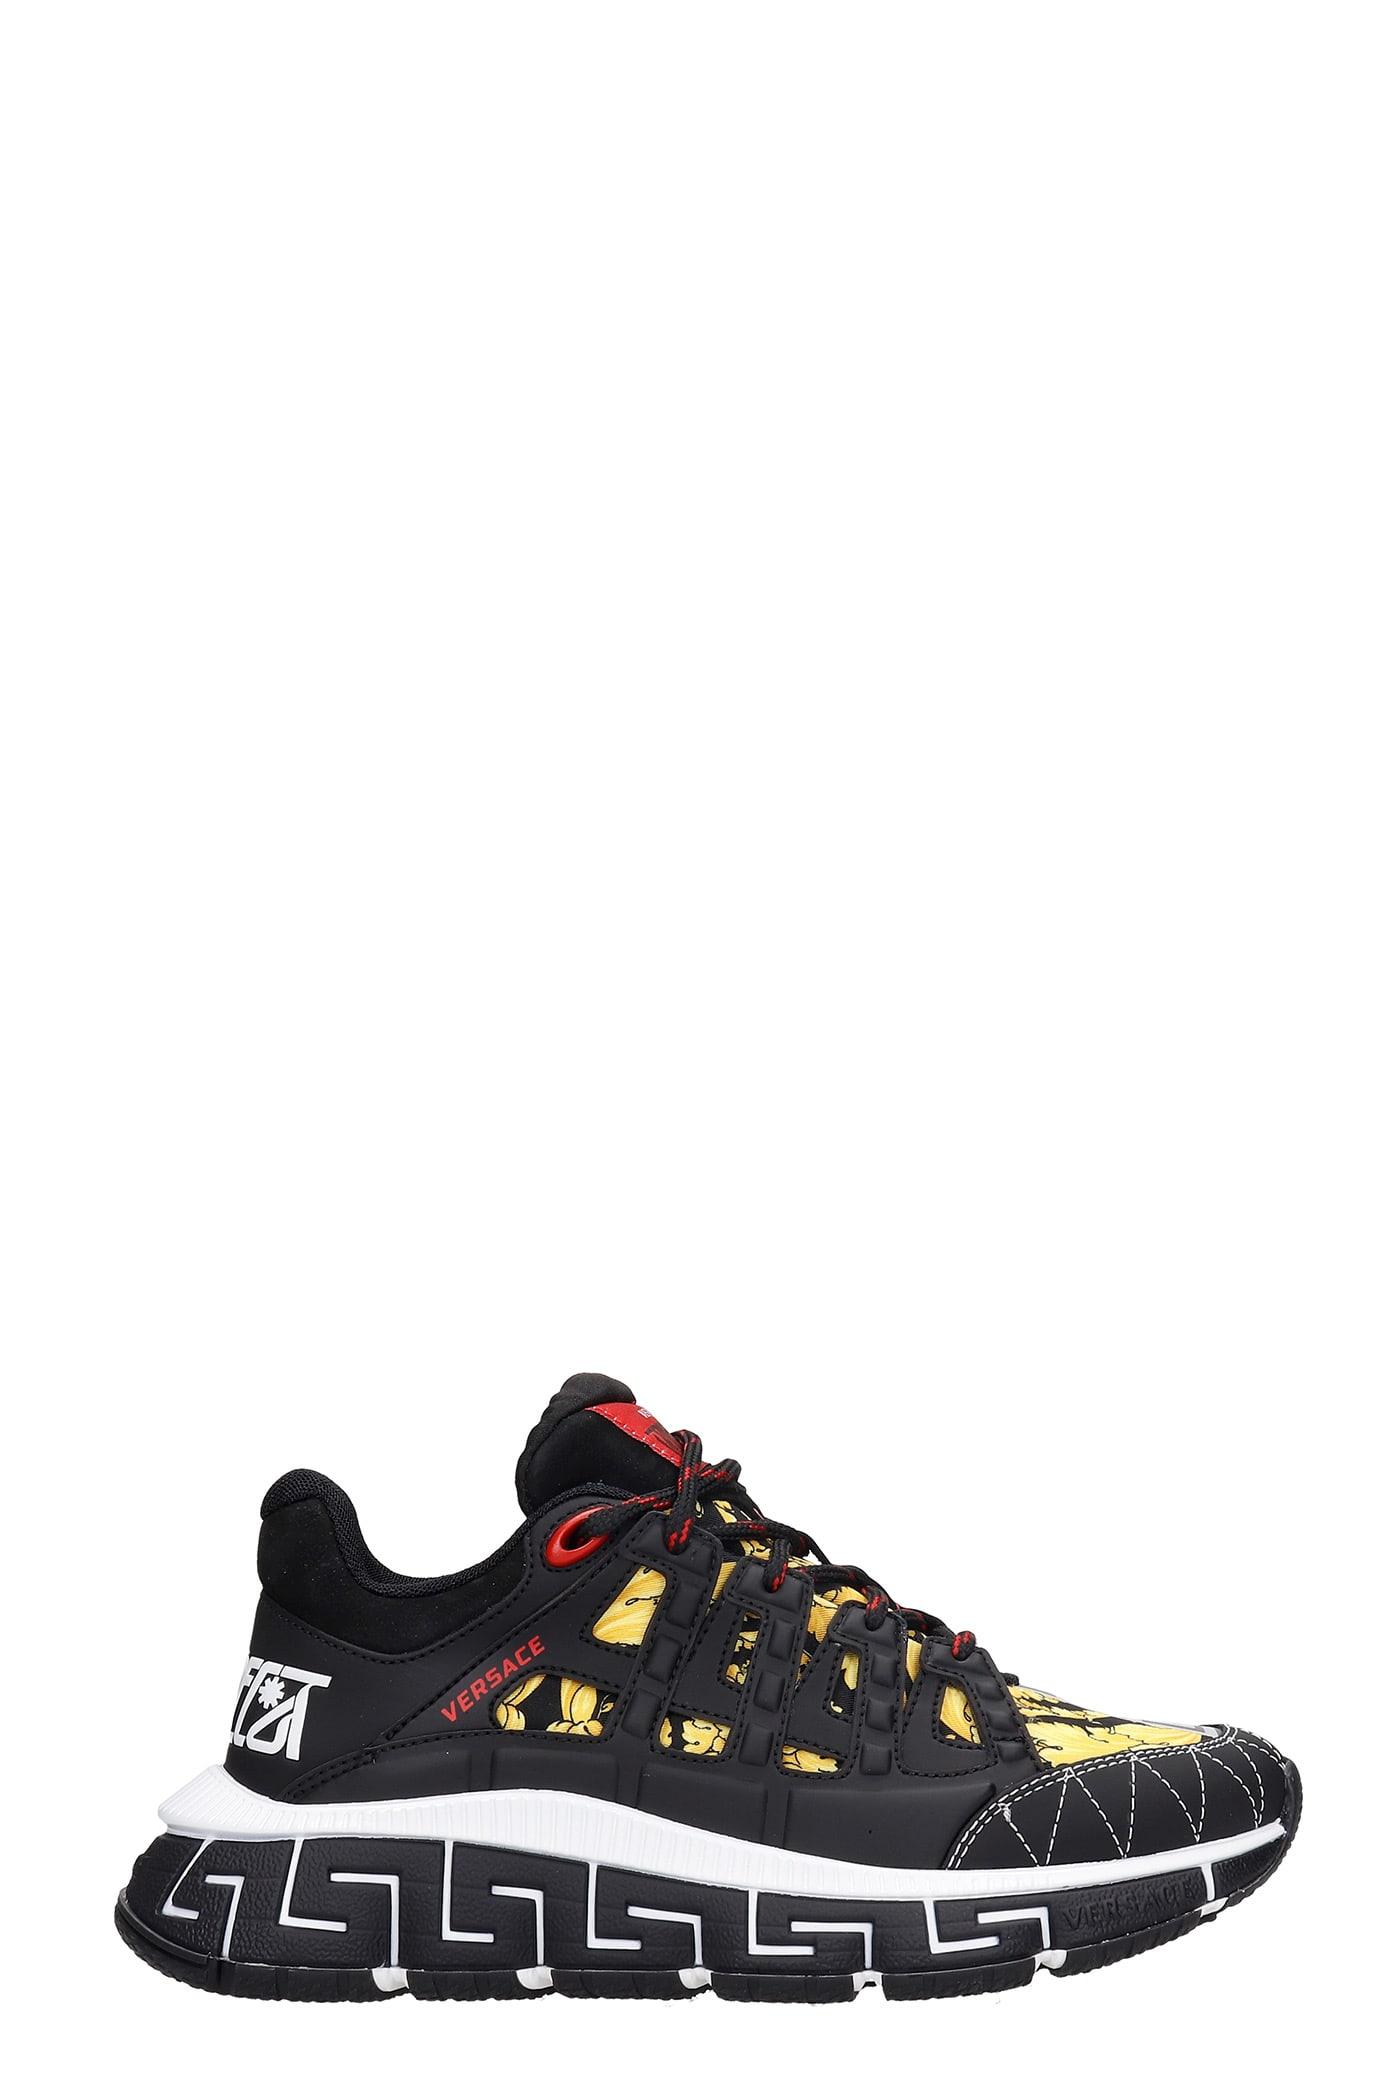 Versace Trigreca Sneakers In Black Synthetic Fibers